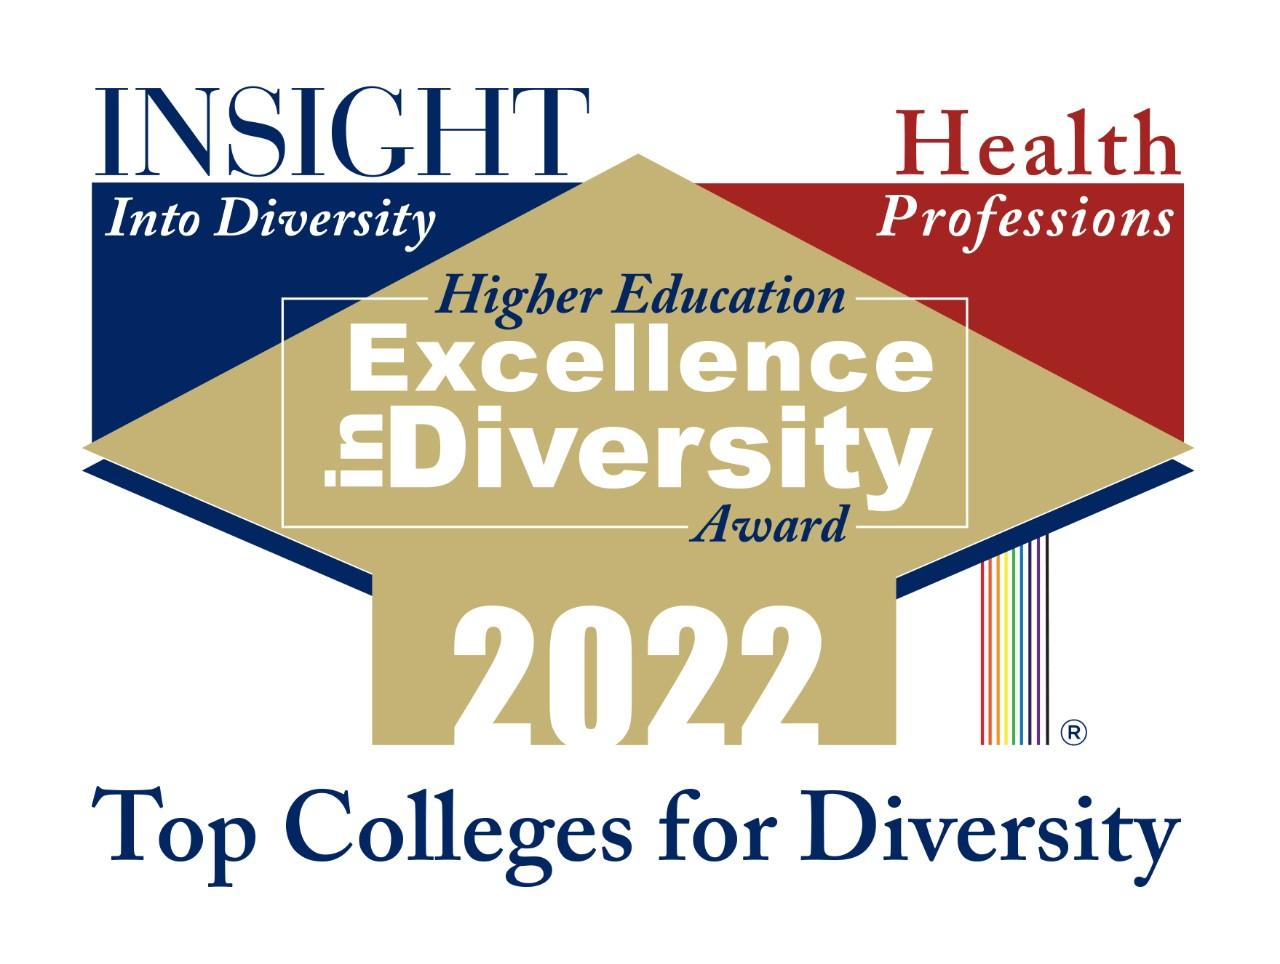 Insight Into Diversity Diversity Champion logo